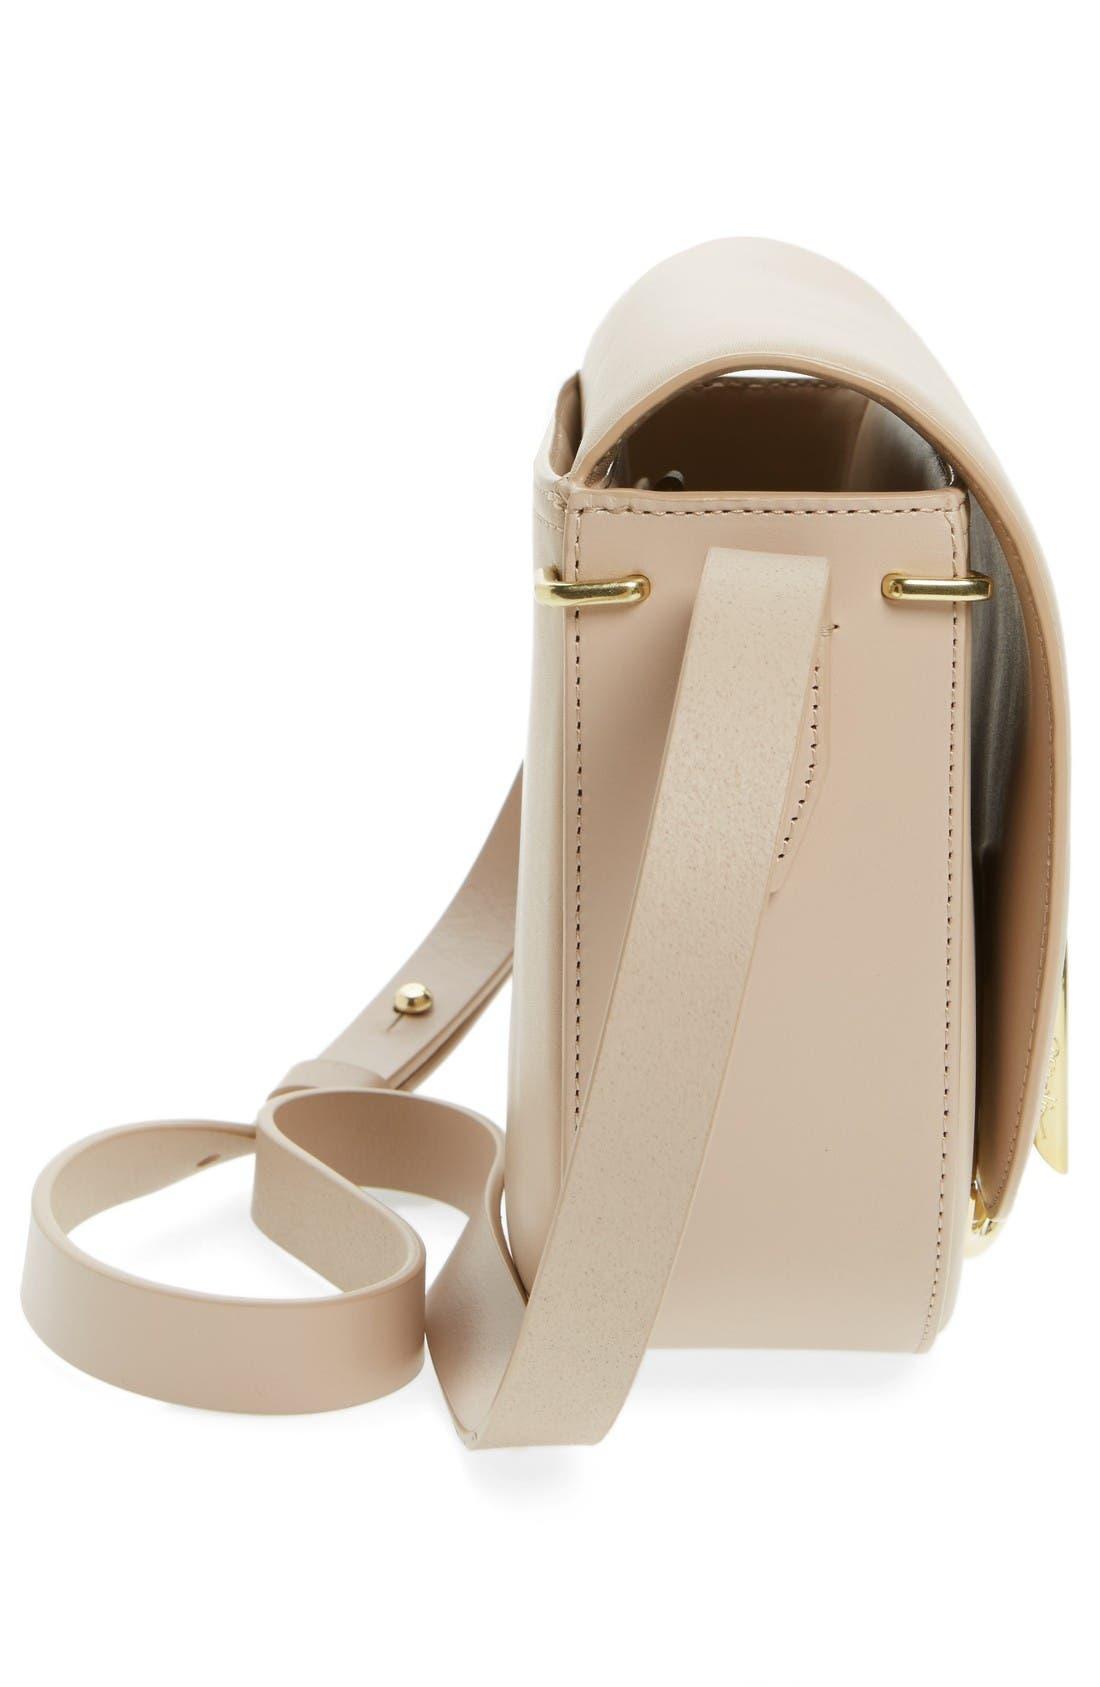 Alix Leather Saddle Bag,                             Alternate thumbnail 4, color,                             Cashew/ Gold